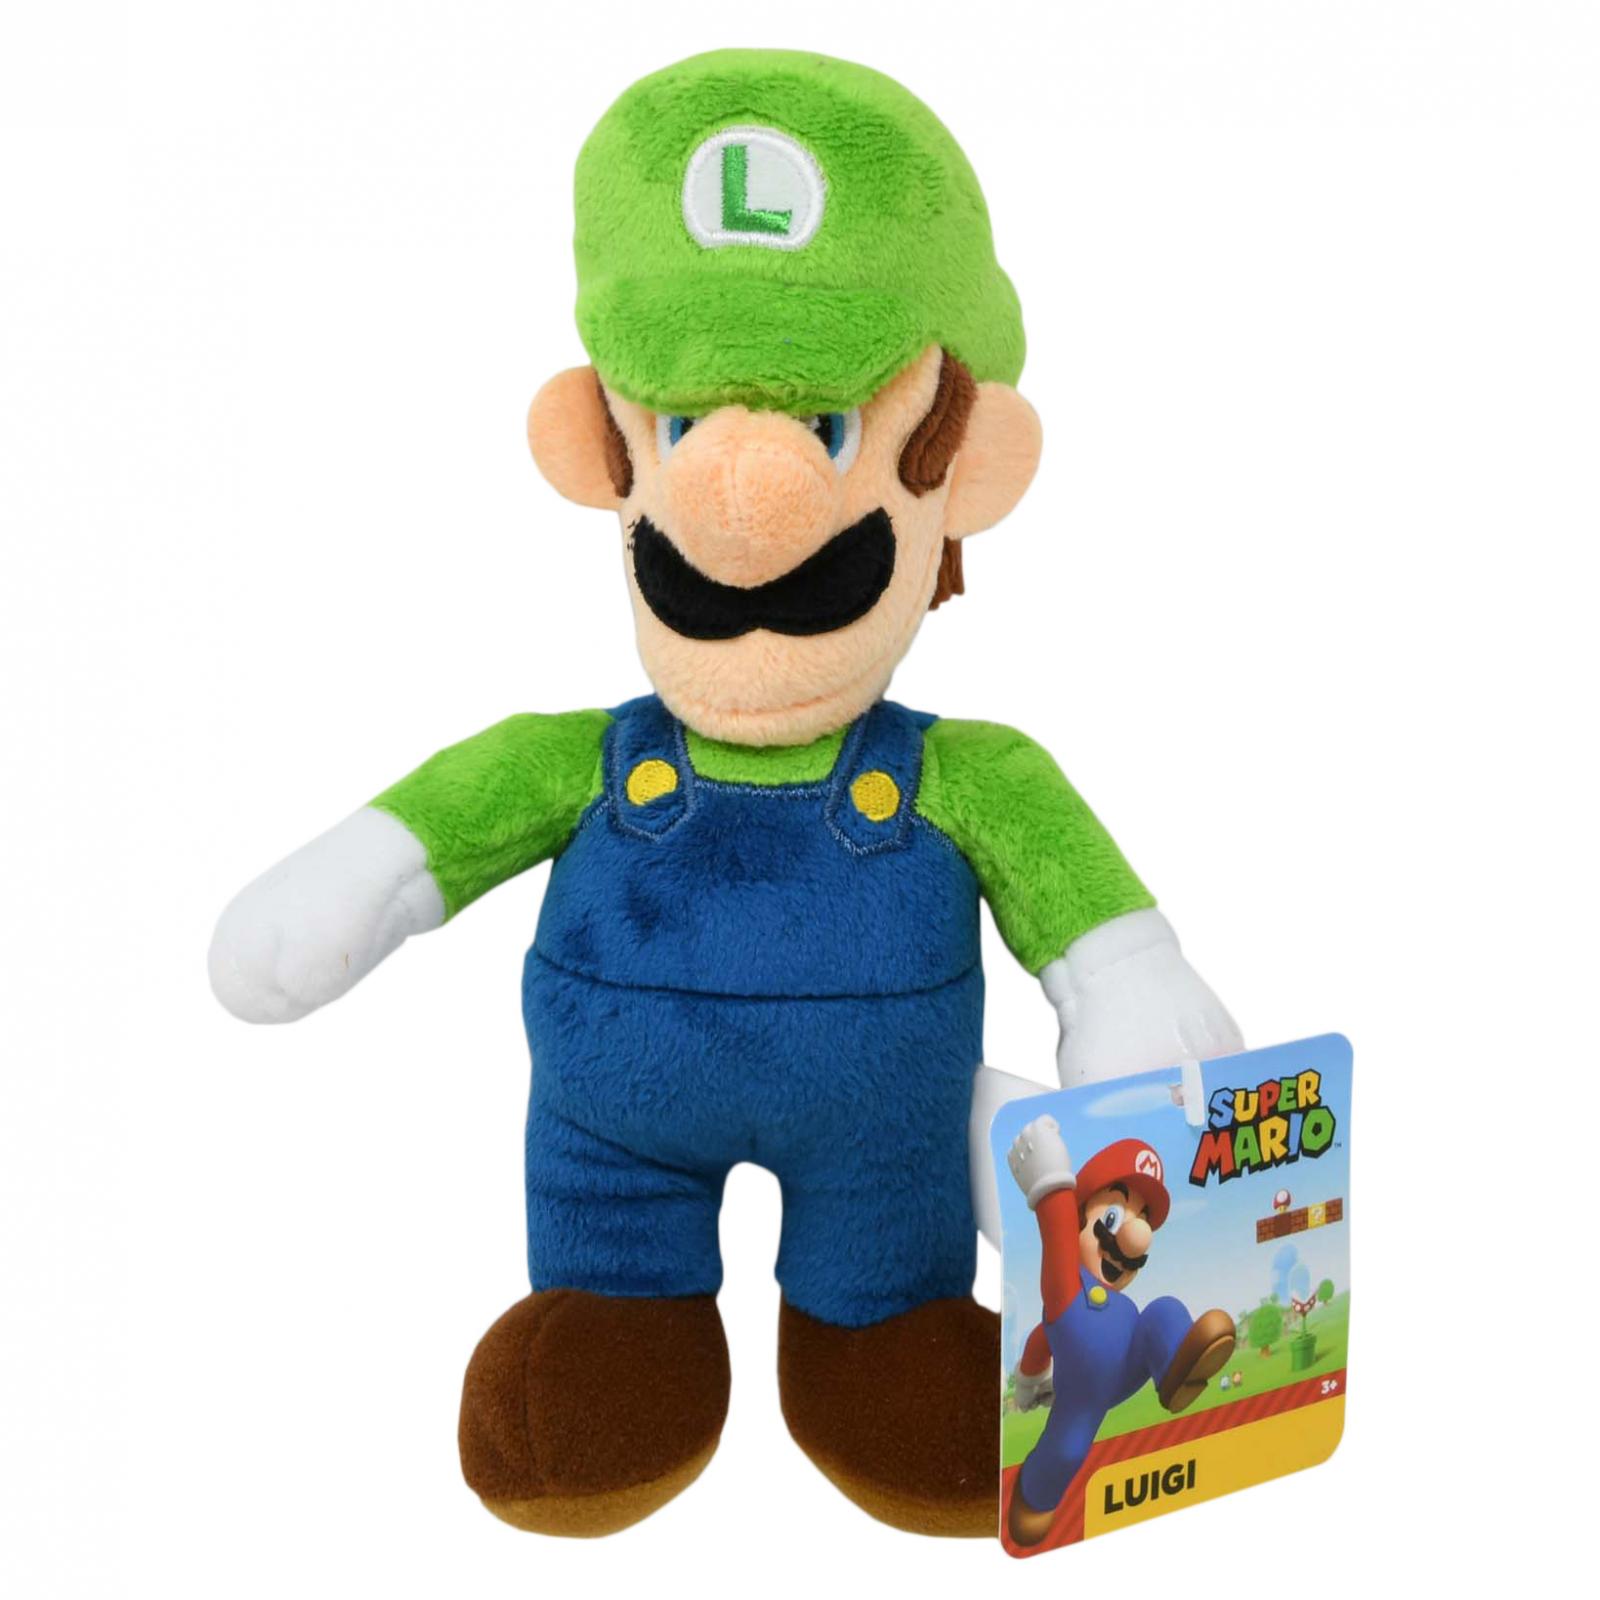 World of Nintendo Super Mario Plush Toy 7.5 Inch Luigi